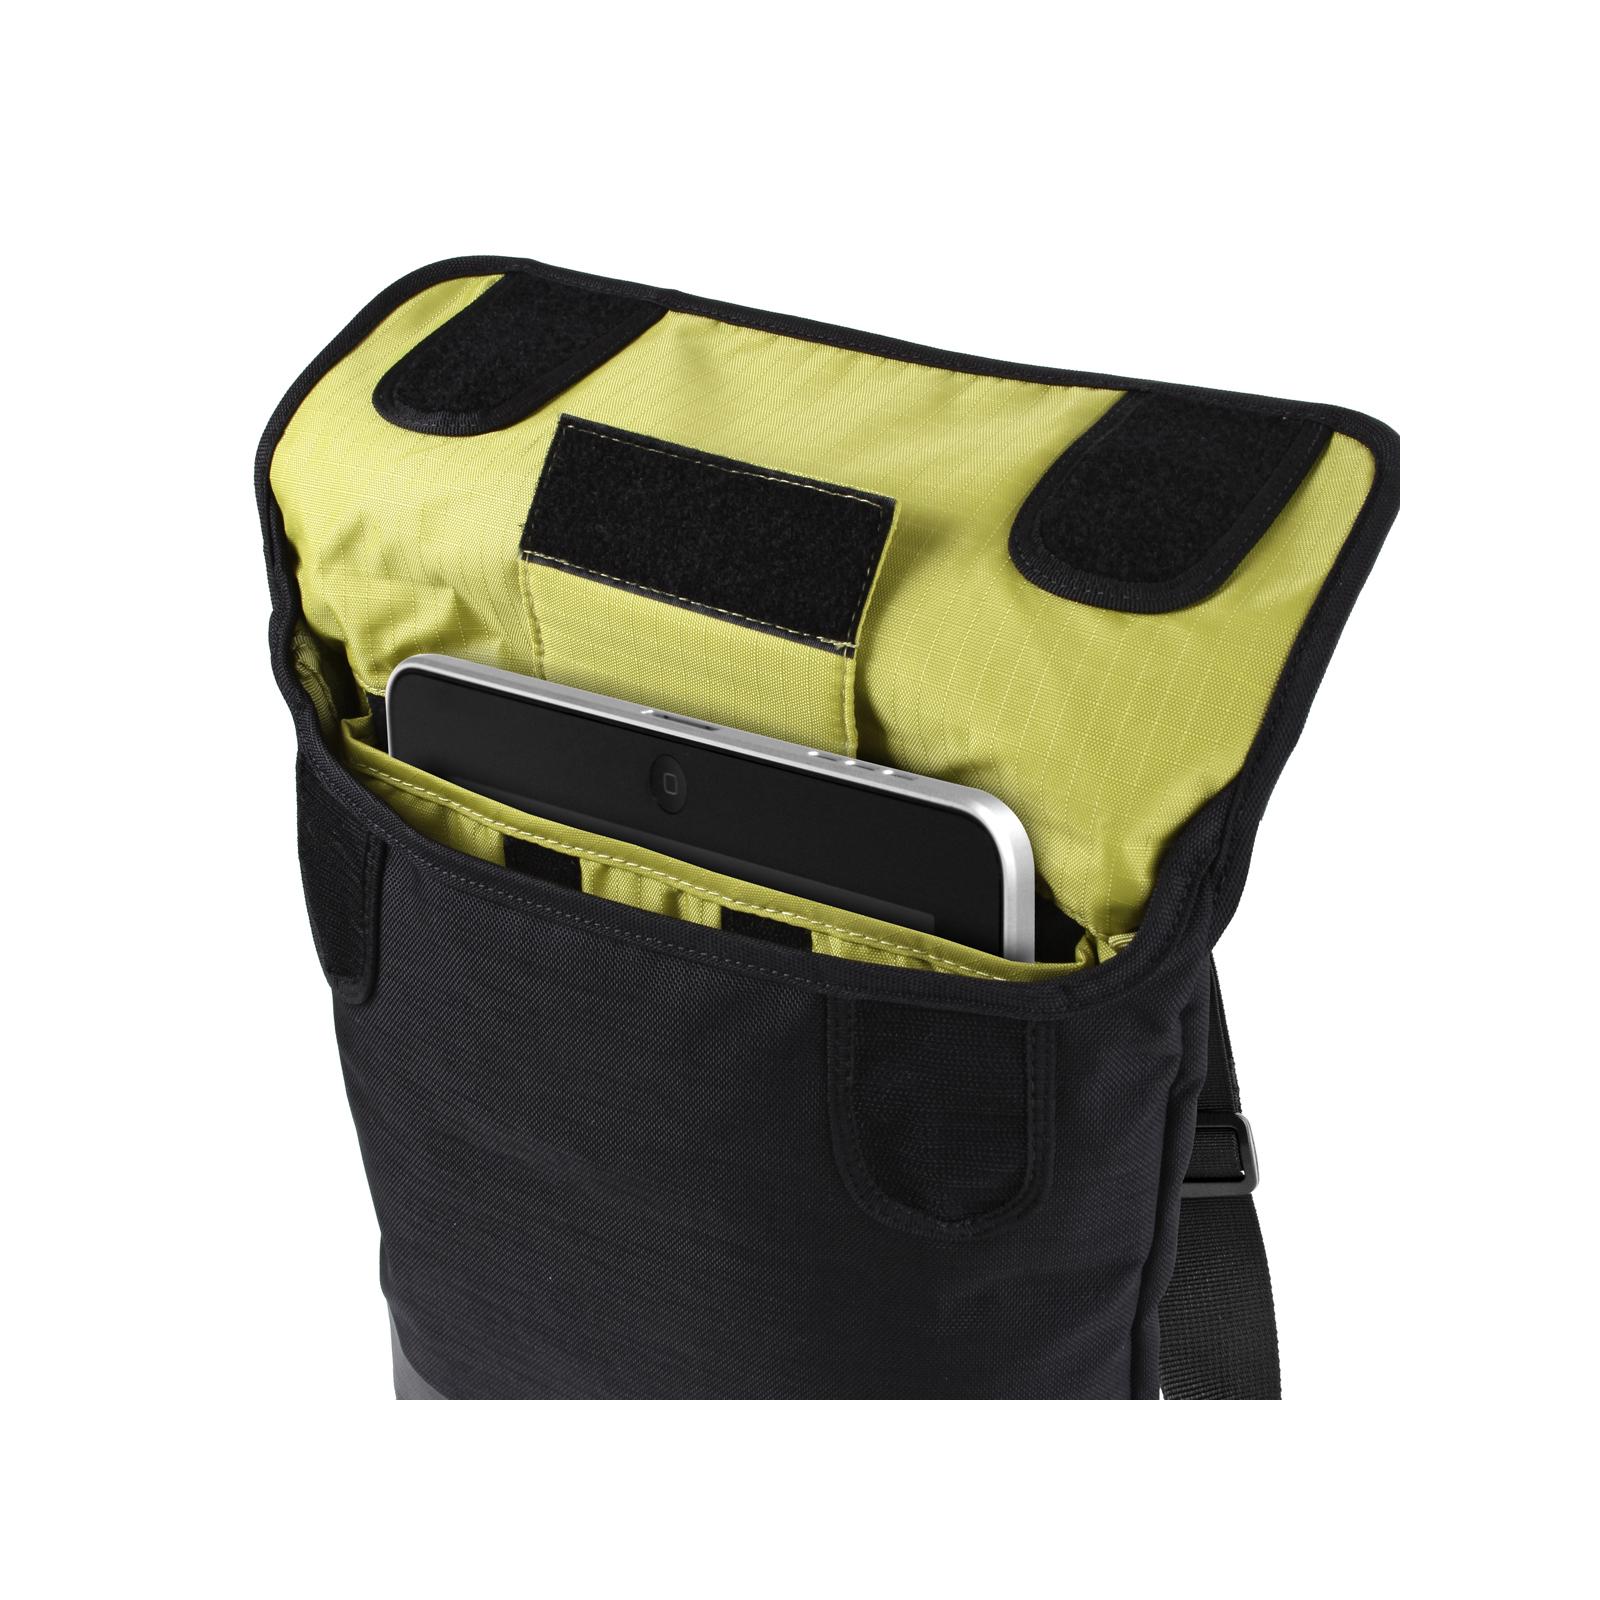 Чехол для планшета Crumpler 9 Private Surprise Sling Tablet/black-black (PSST-001) изображение 5